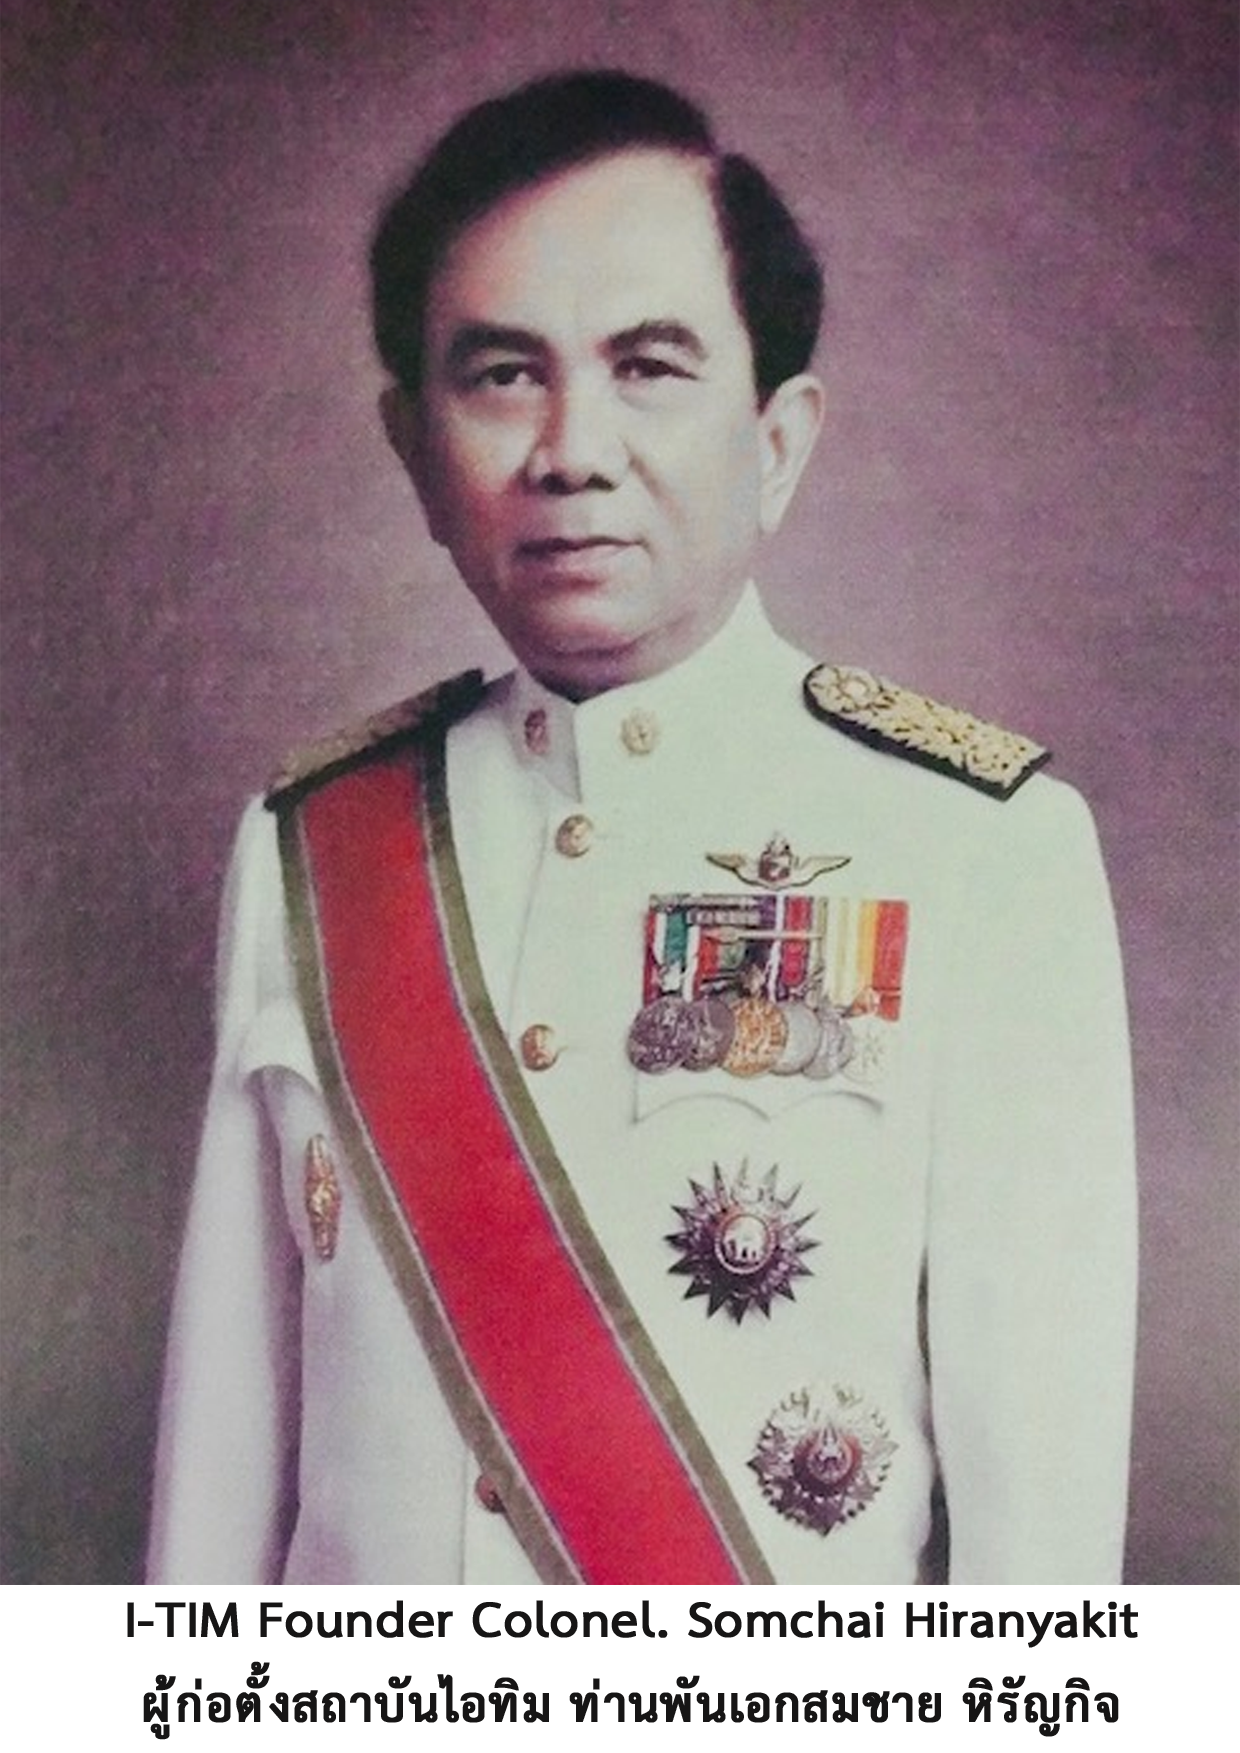 ….     I-TIM Founder Colonel Somchai Hiranyakit     ..    ผู้ก่อตั้งสถาบันไอทิม    ท่านพันเอกสมชาย หิรัญกิจ    ….